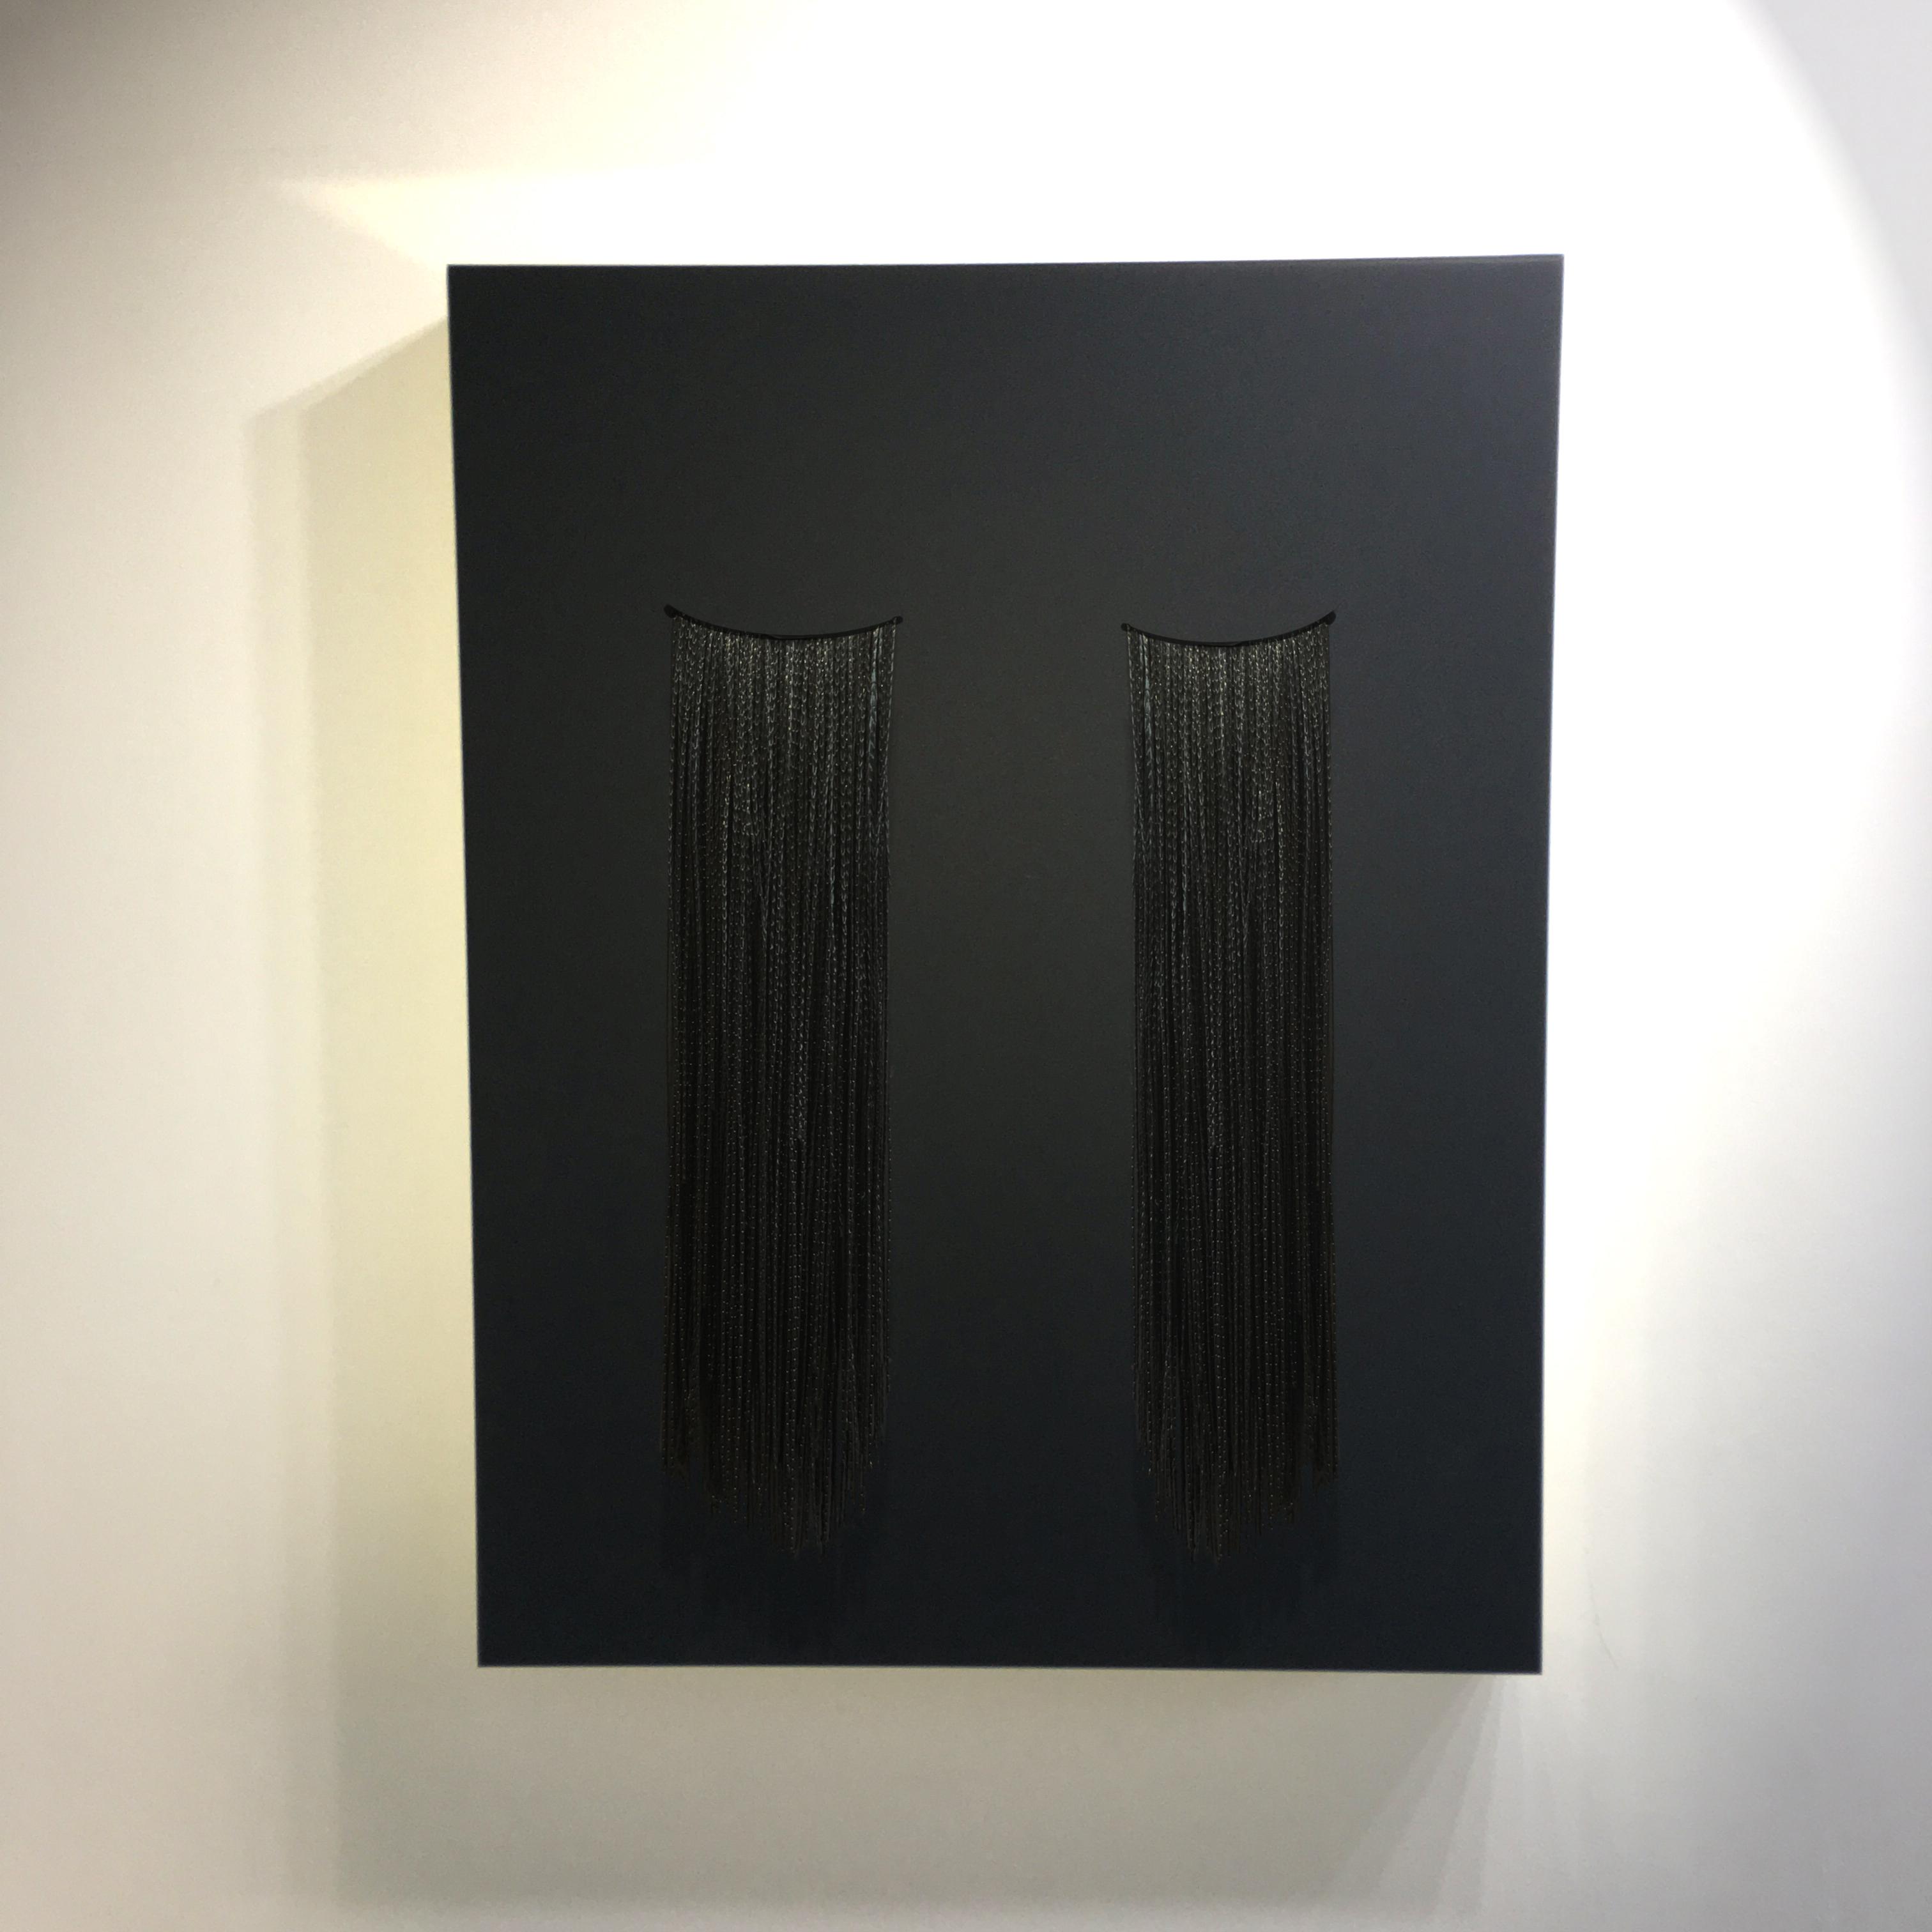 Untitled 2019